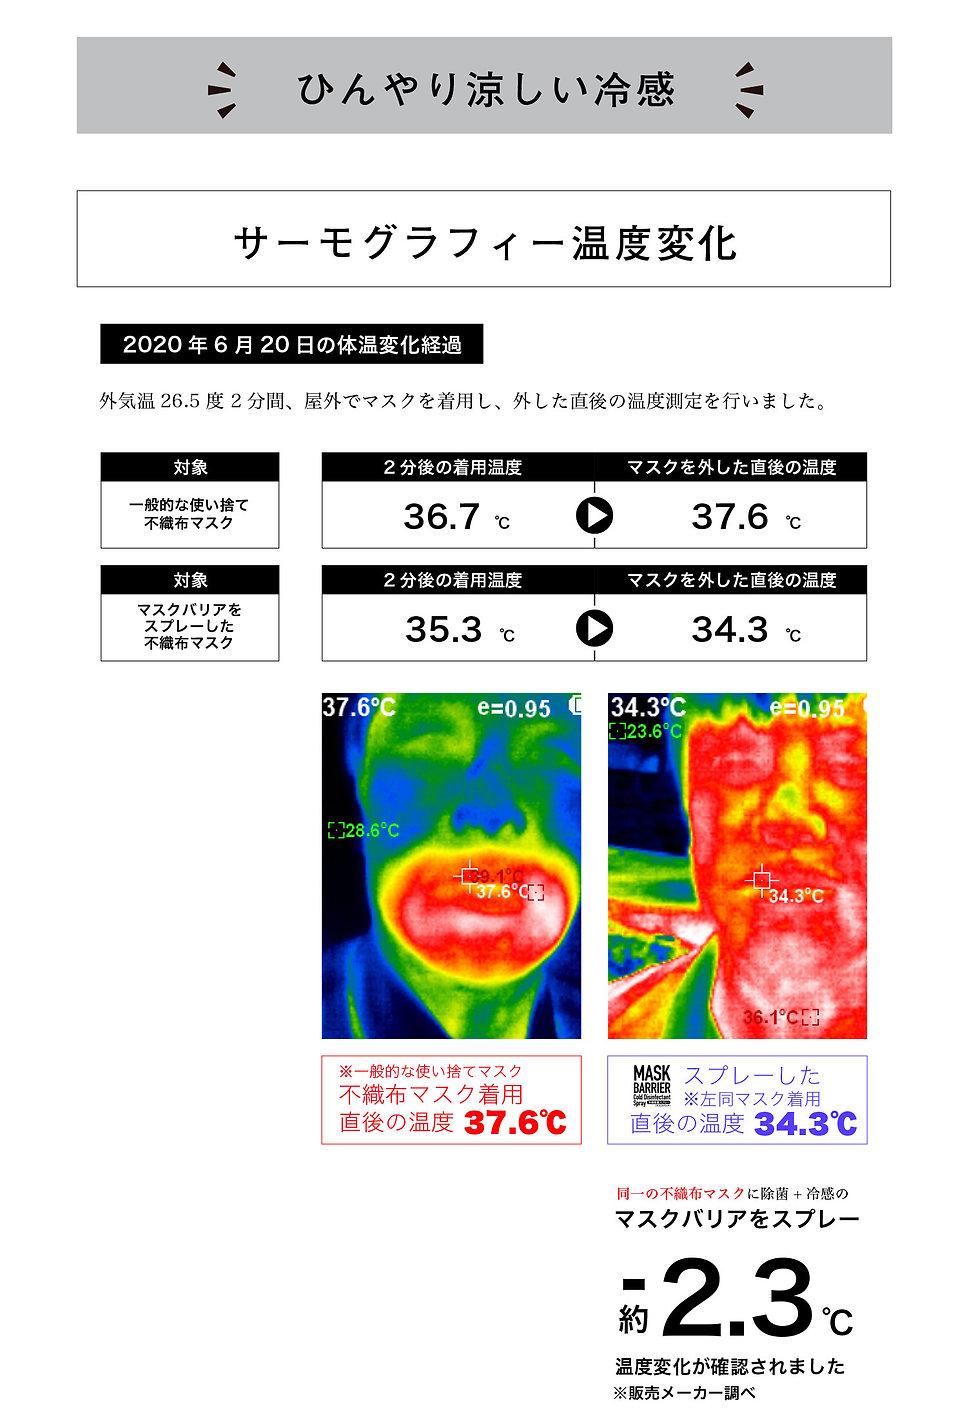 mask-sp02-2-3.jpg